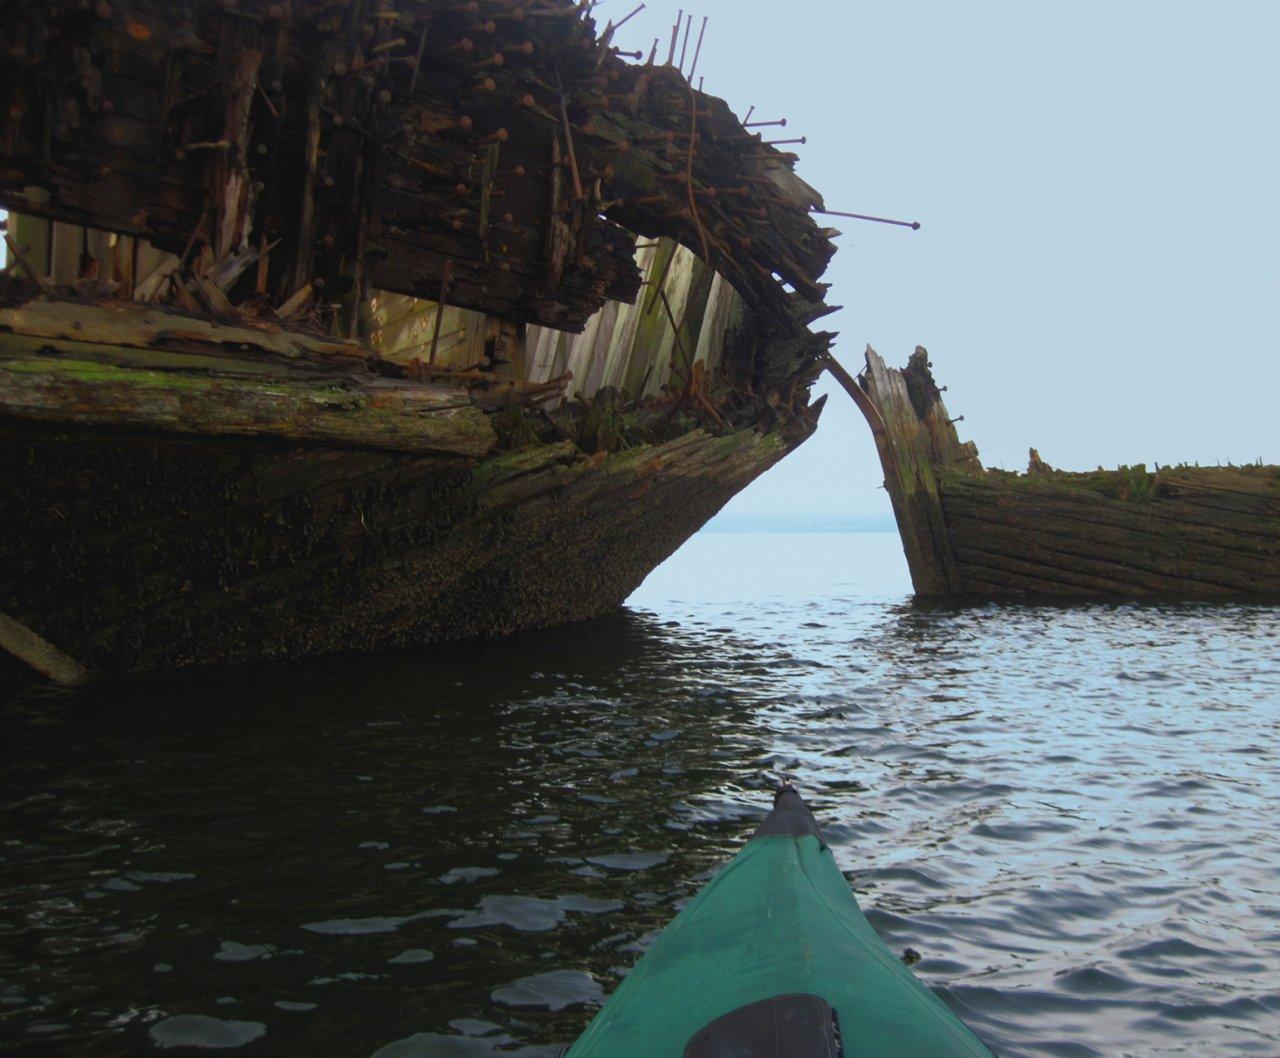 04 Through the wooden ships.JPG